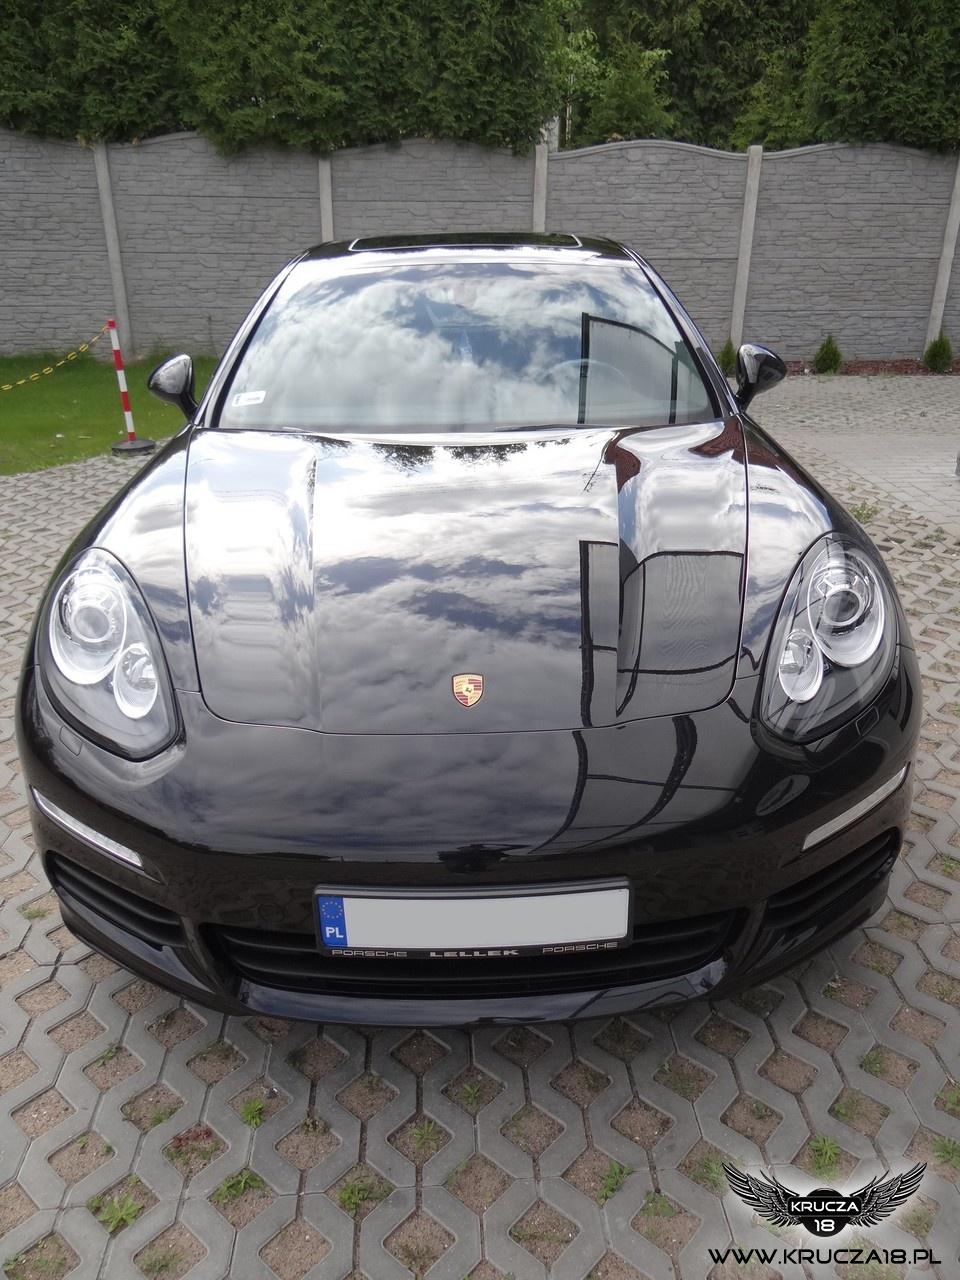 Porsche Panamera - Ceramic PRO 9H